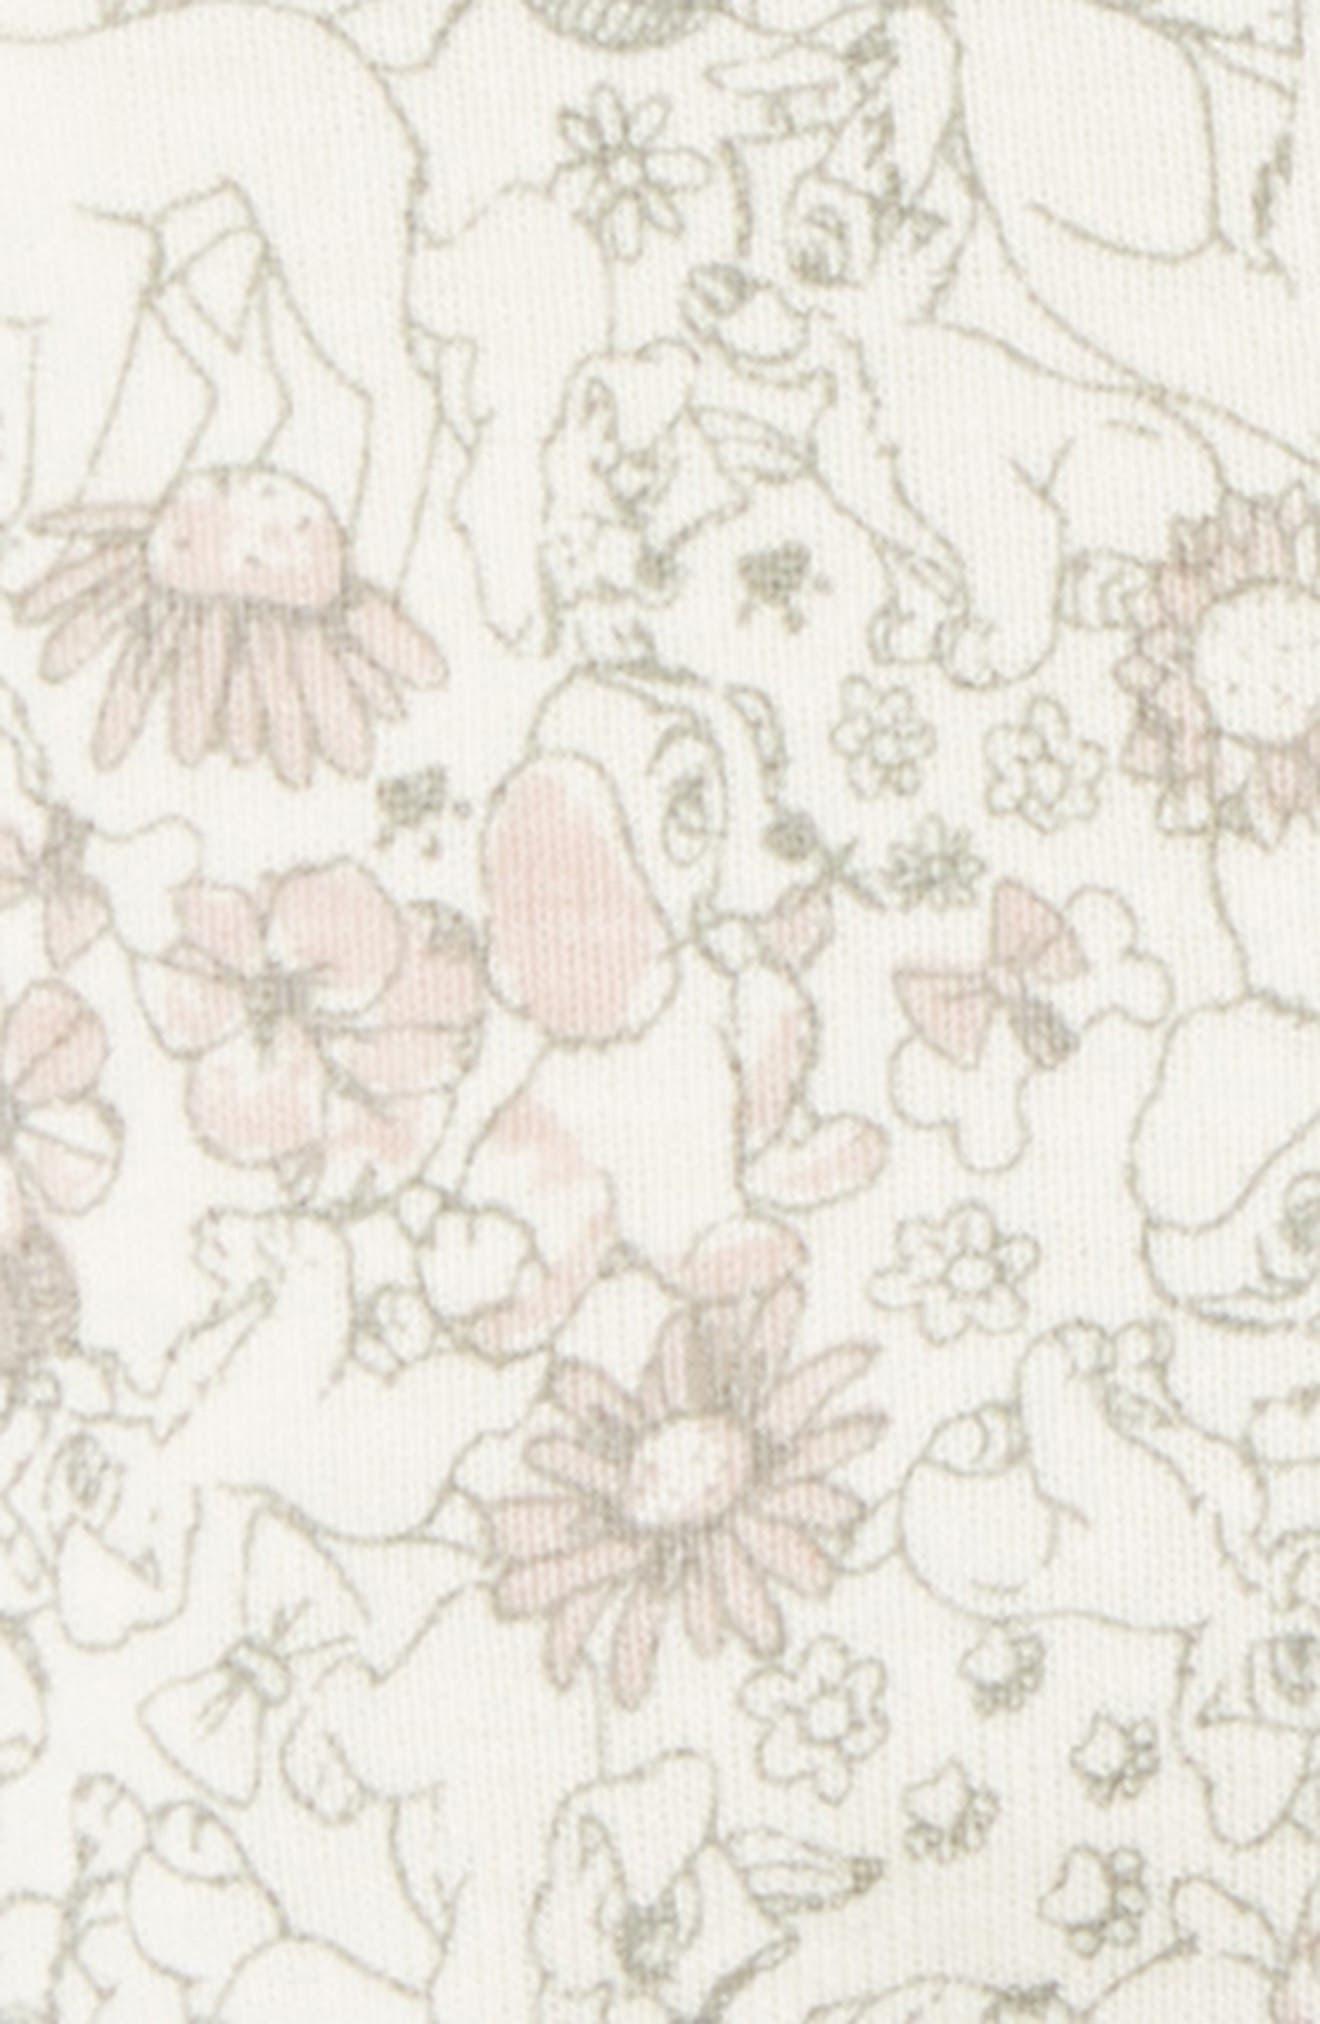 Disney 'Lady & the Tramp' Organic Cotton Dress,                             Alternate thumbnail 2, color,